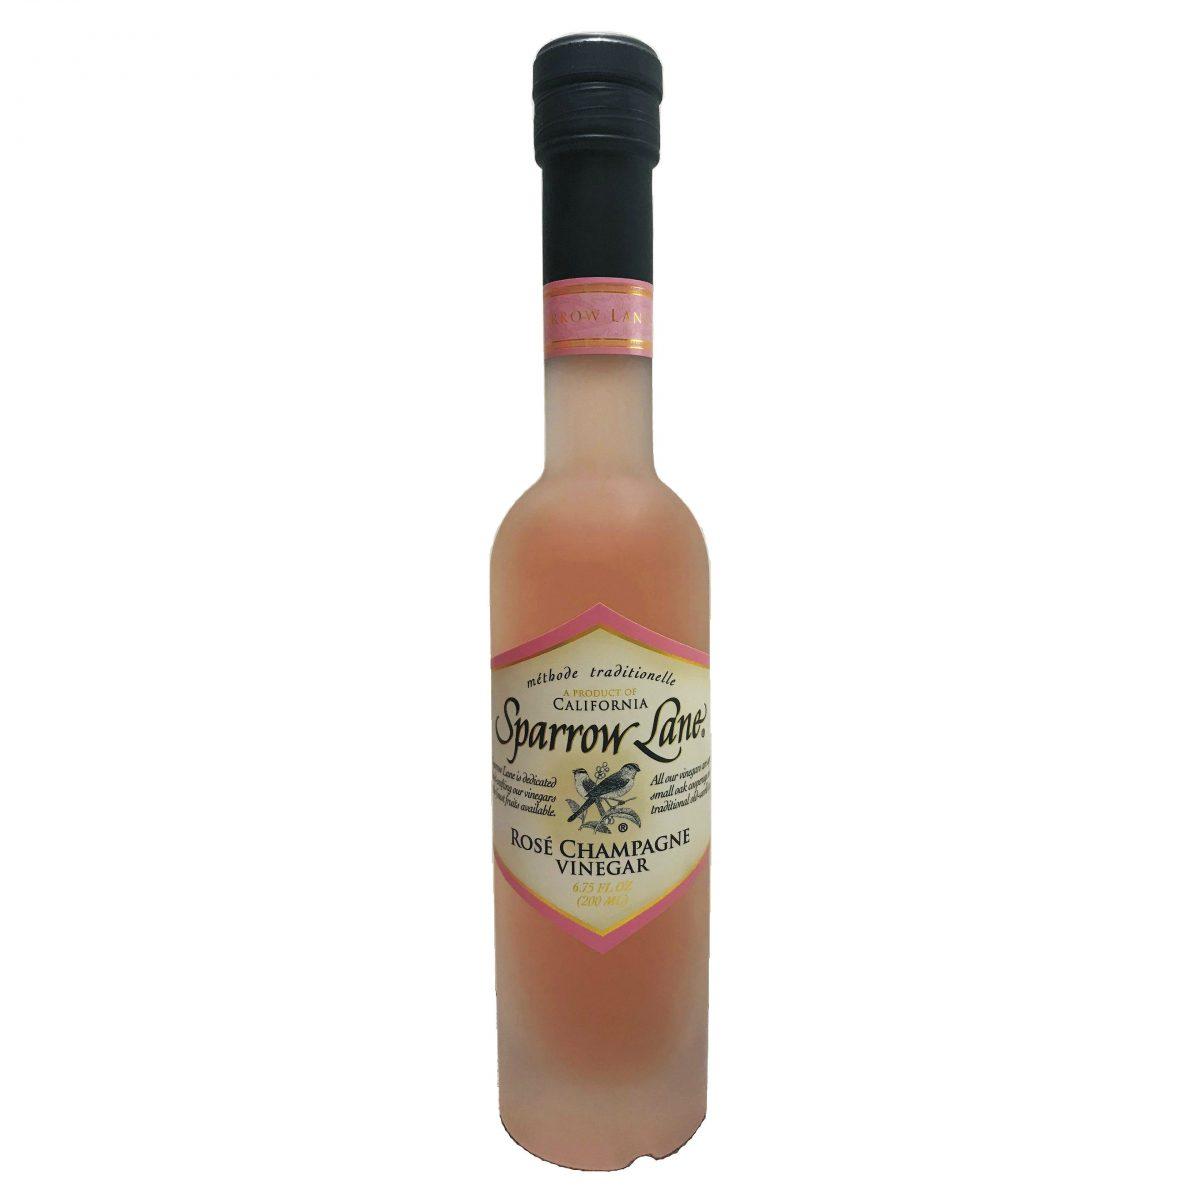 rose-champagne-img-1-1-e1590095849992-1